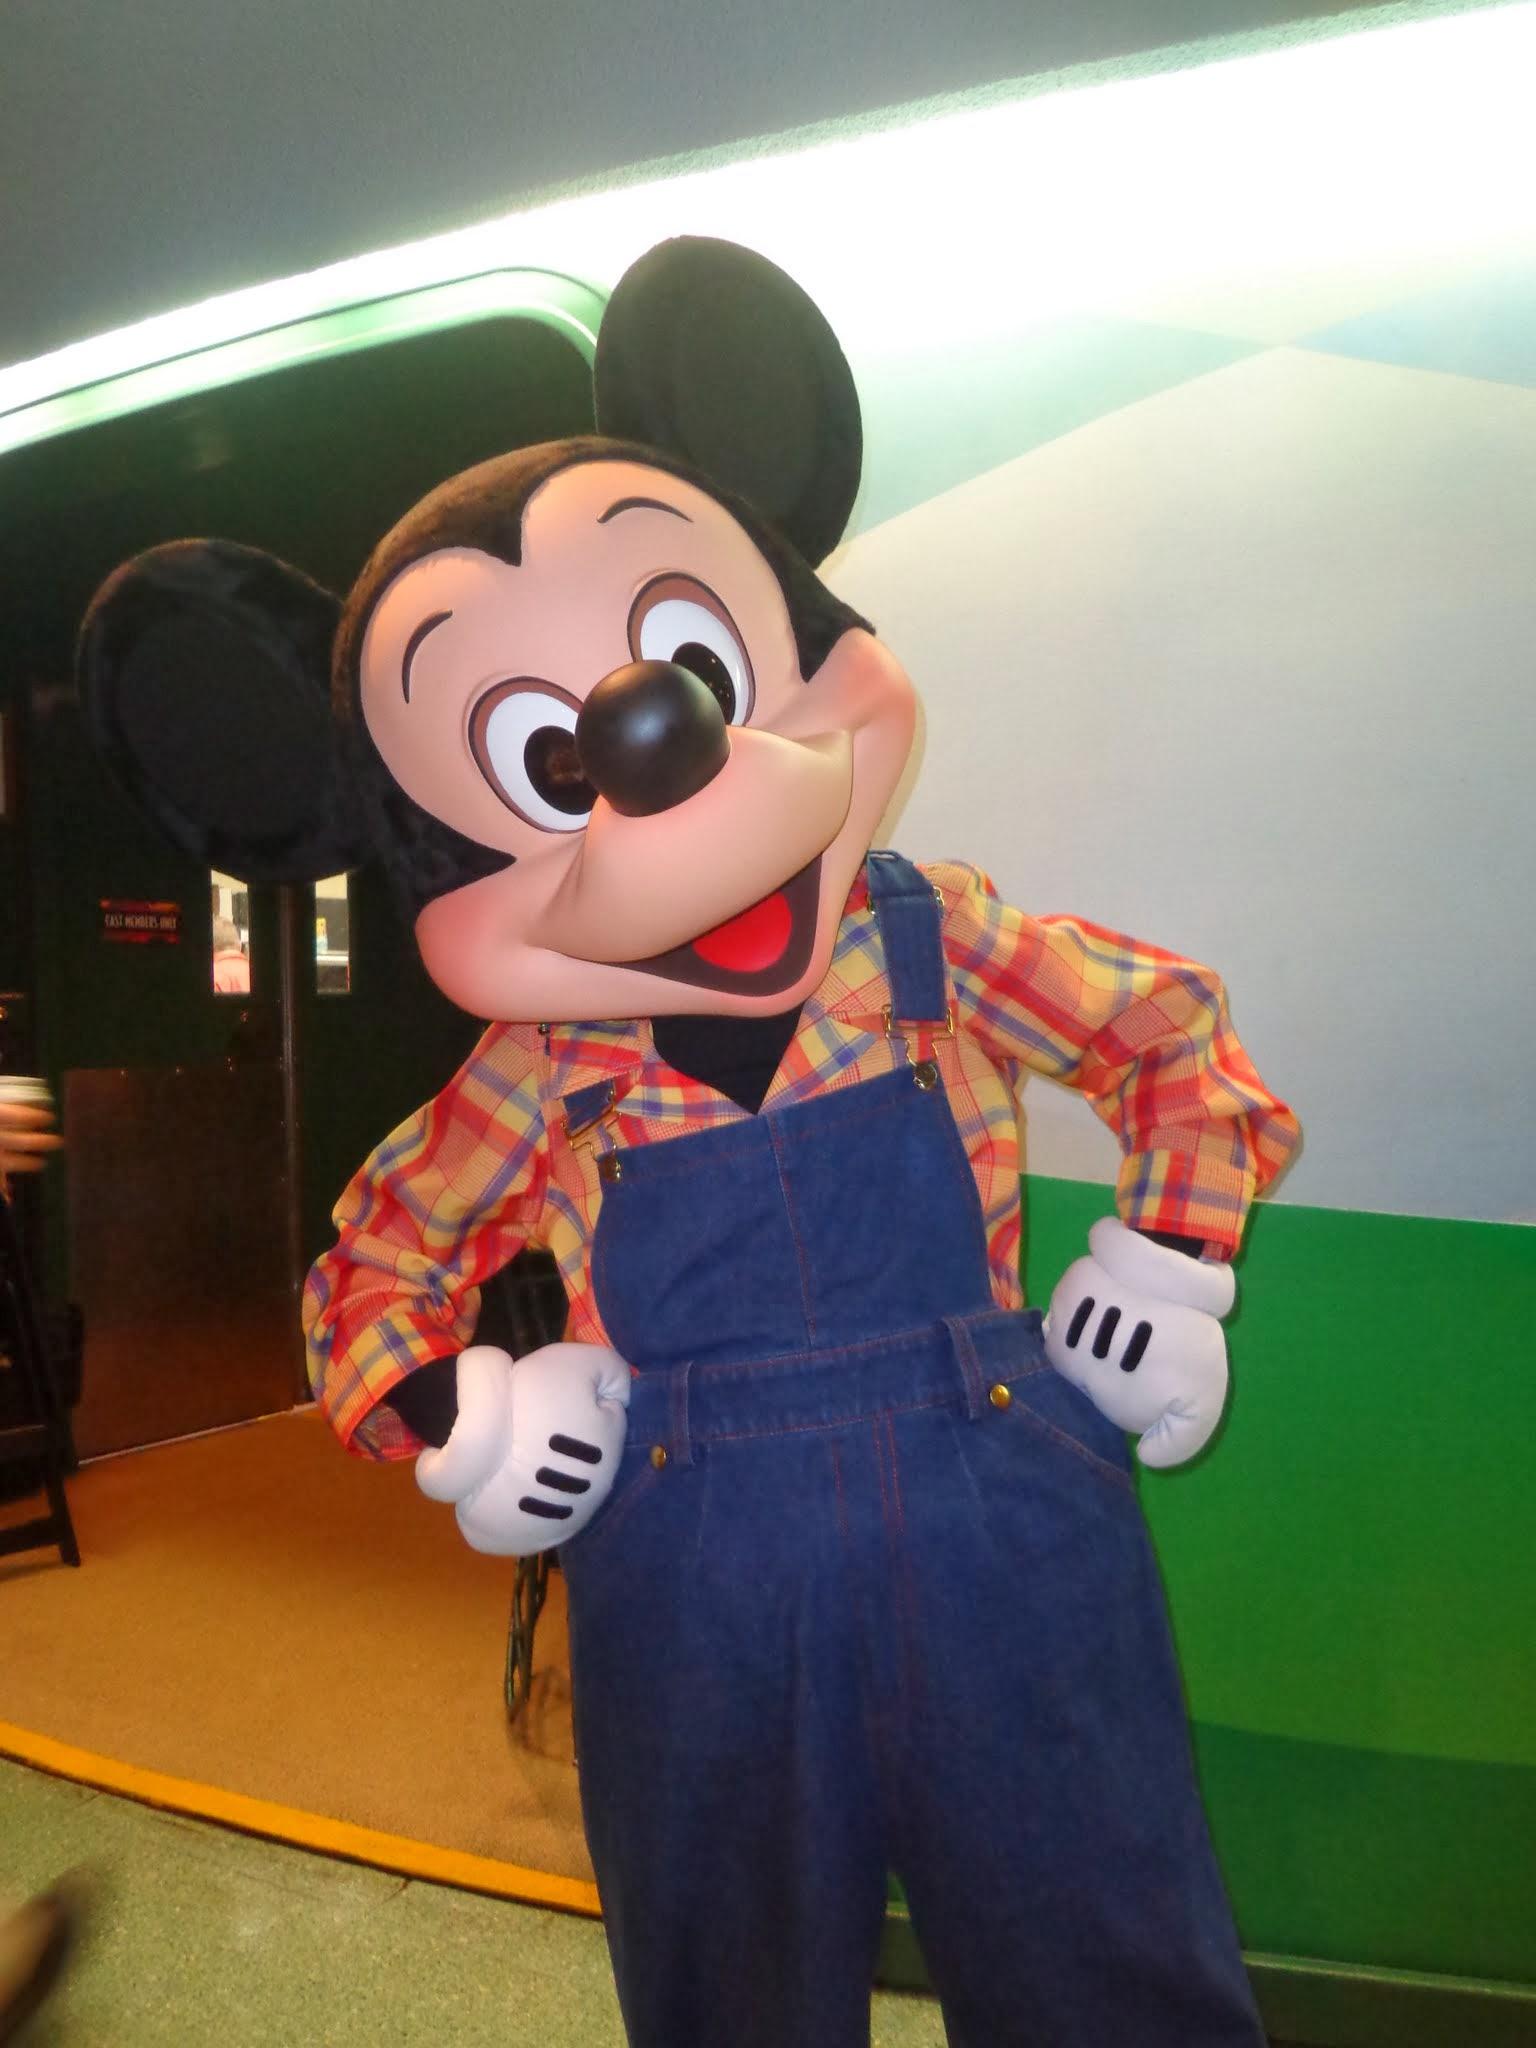 GG_Mickey.JPG